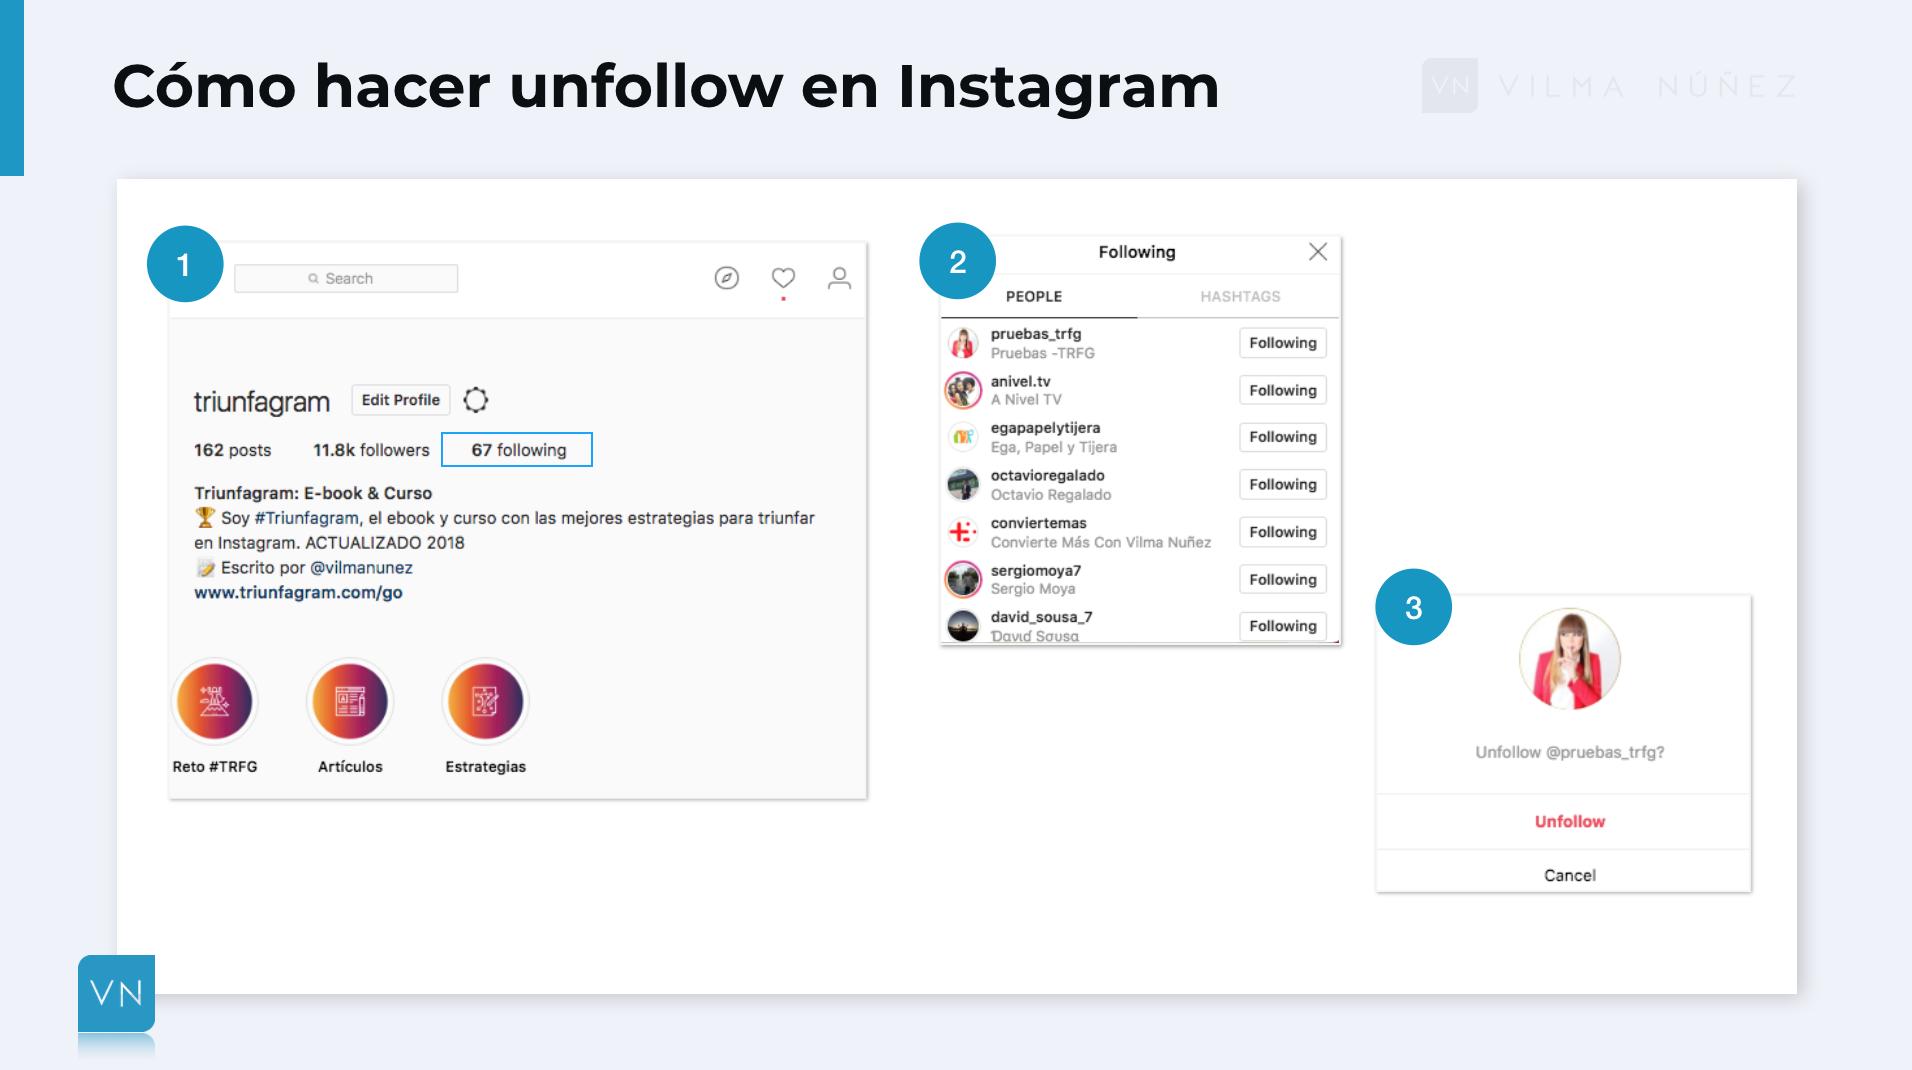 hacer unfollow en instagram paso a paso